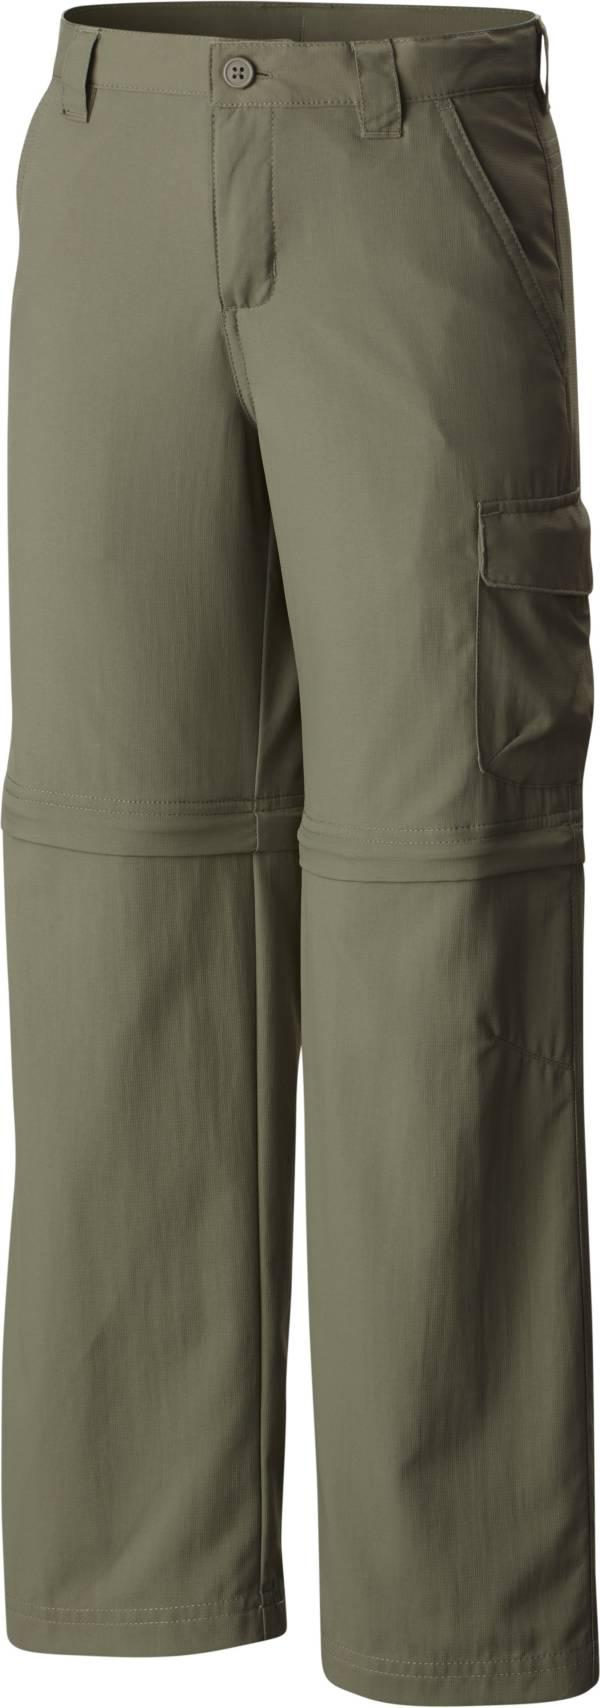 Columbia Boys' Silver Ridge III Convertible Pant product image